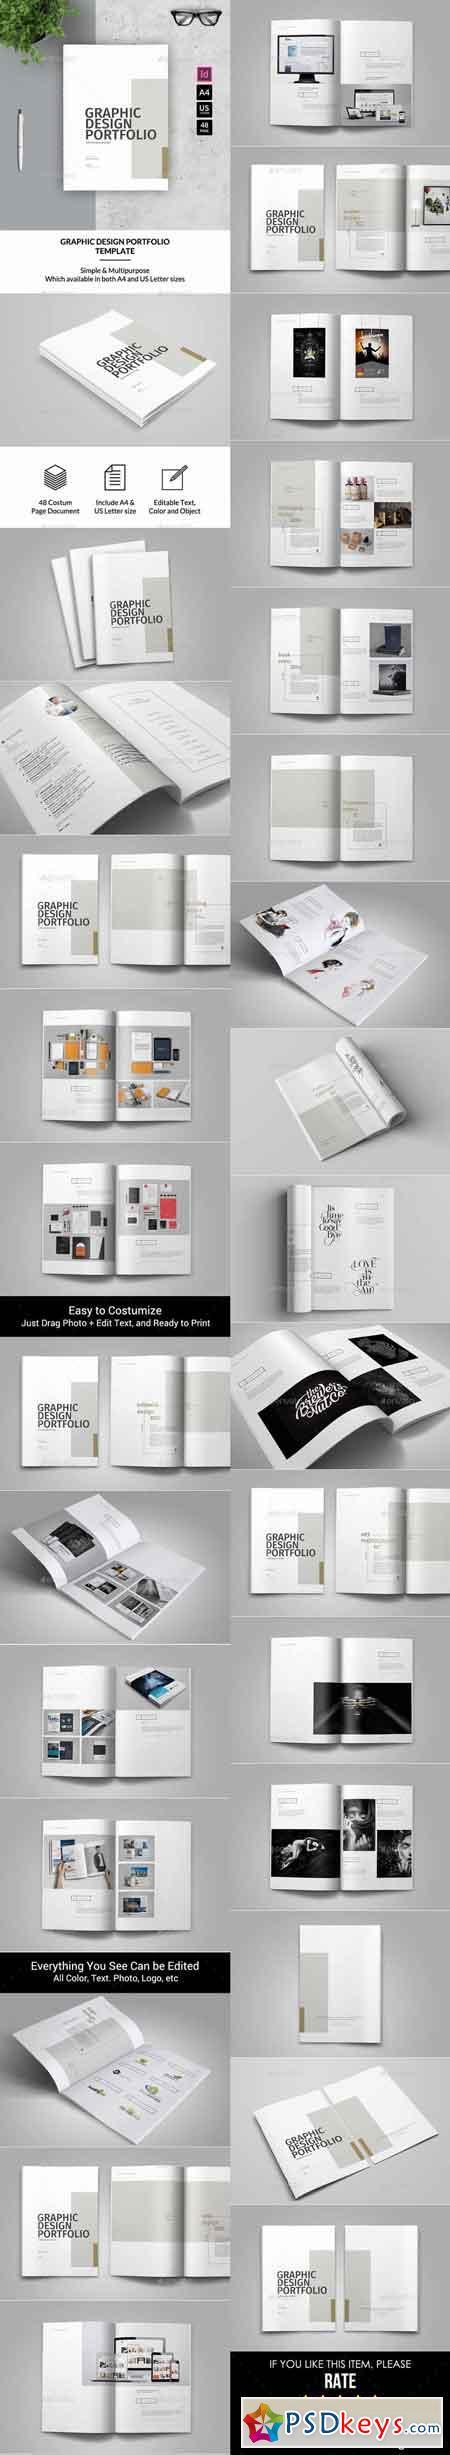 Generous Pdf Portfolio Template Photos - Entry Level Resume ...